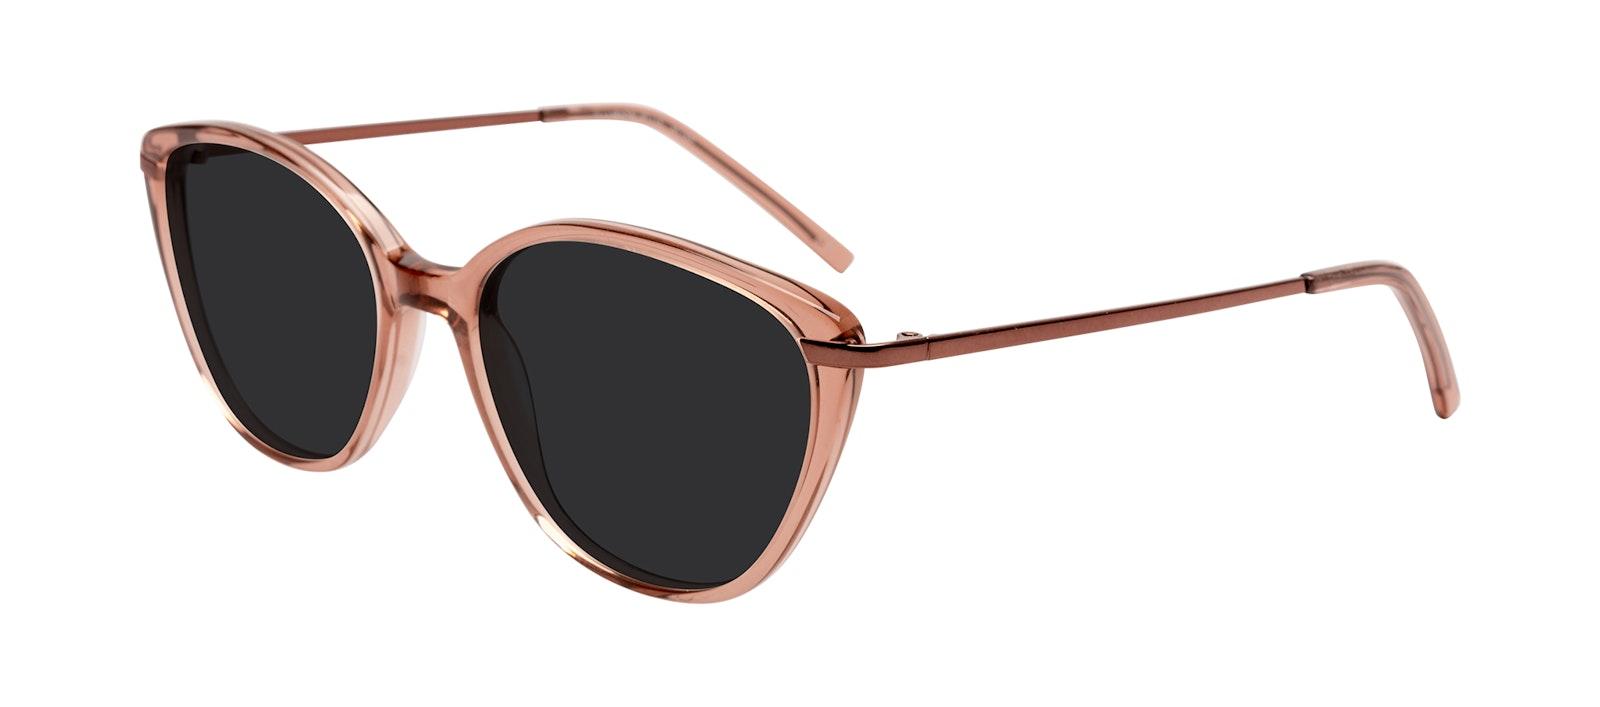 Affordable Fashion Glasses Sunglasses Women Illusion Plus Rose Tilt